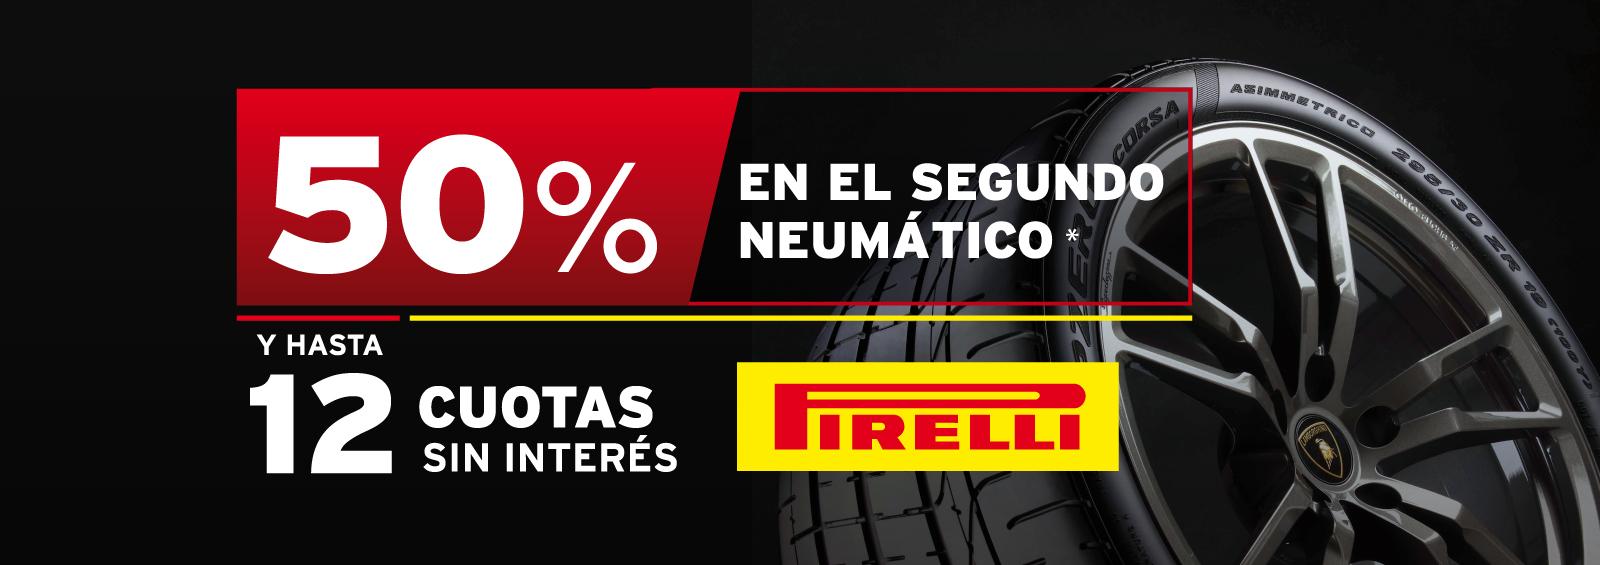 Promo 50% Segundo Neumático